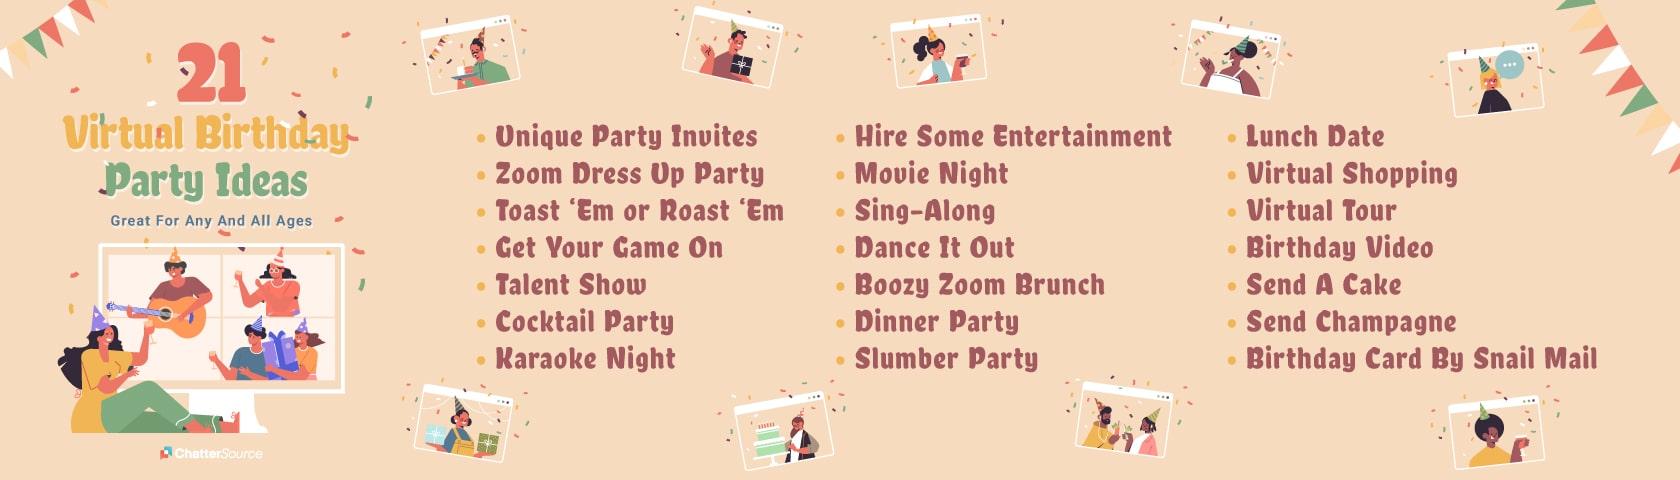 virtual birthday party ideas infographic